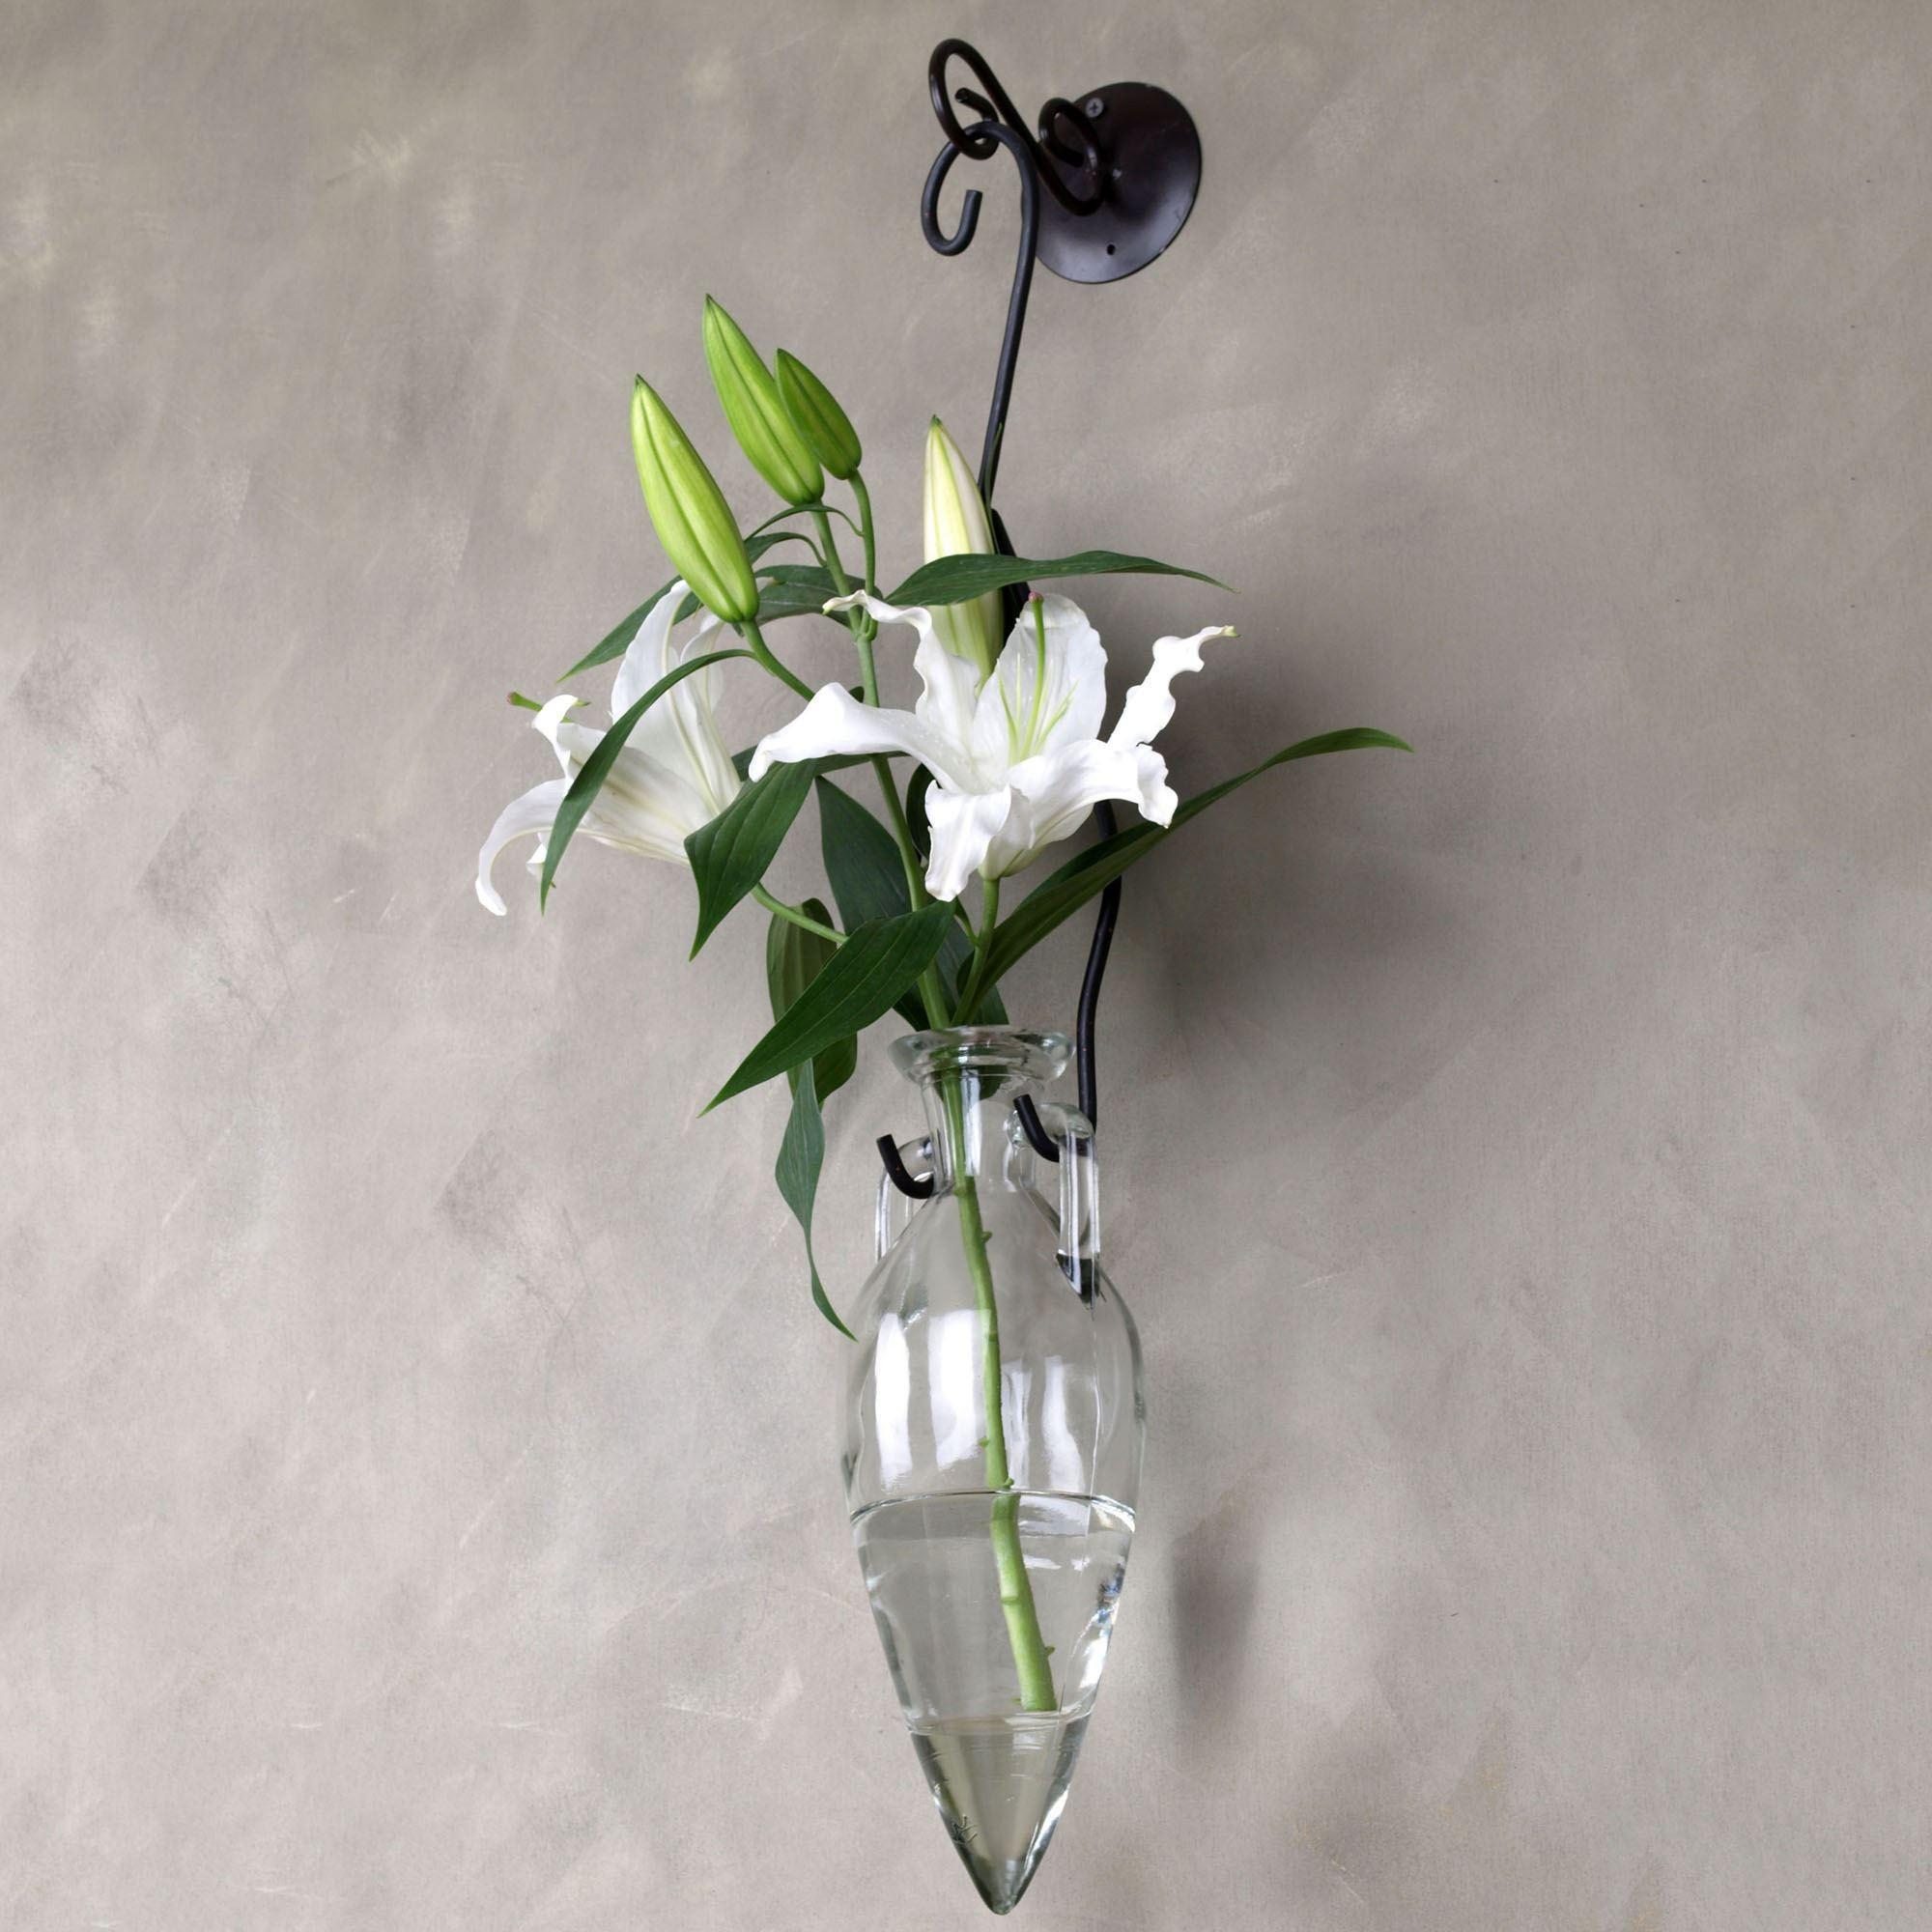 wine bottle vase diy of wall vase holder collection flower holder lovely h vases wall throughout flower holder lovely h vases wall hanging flower vase